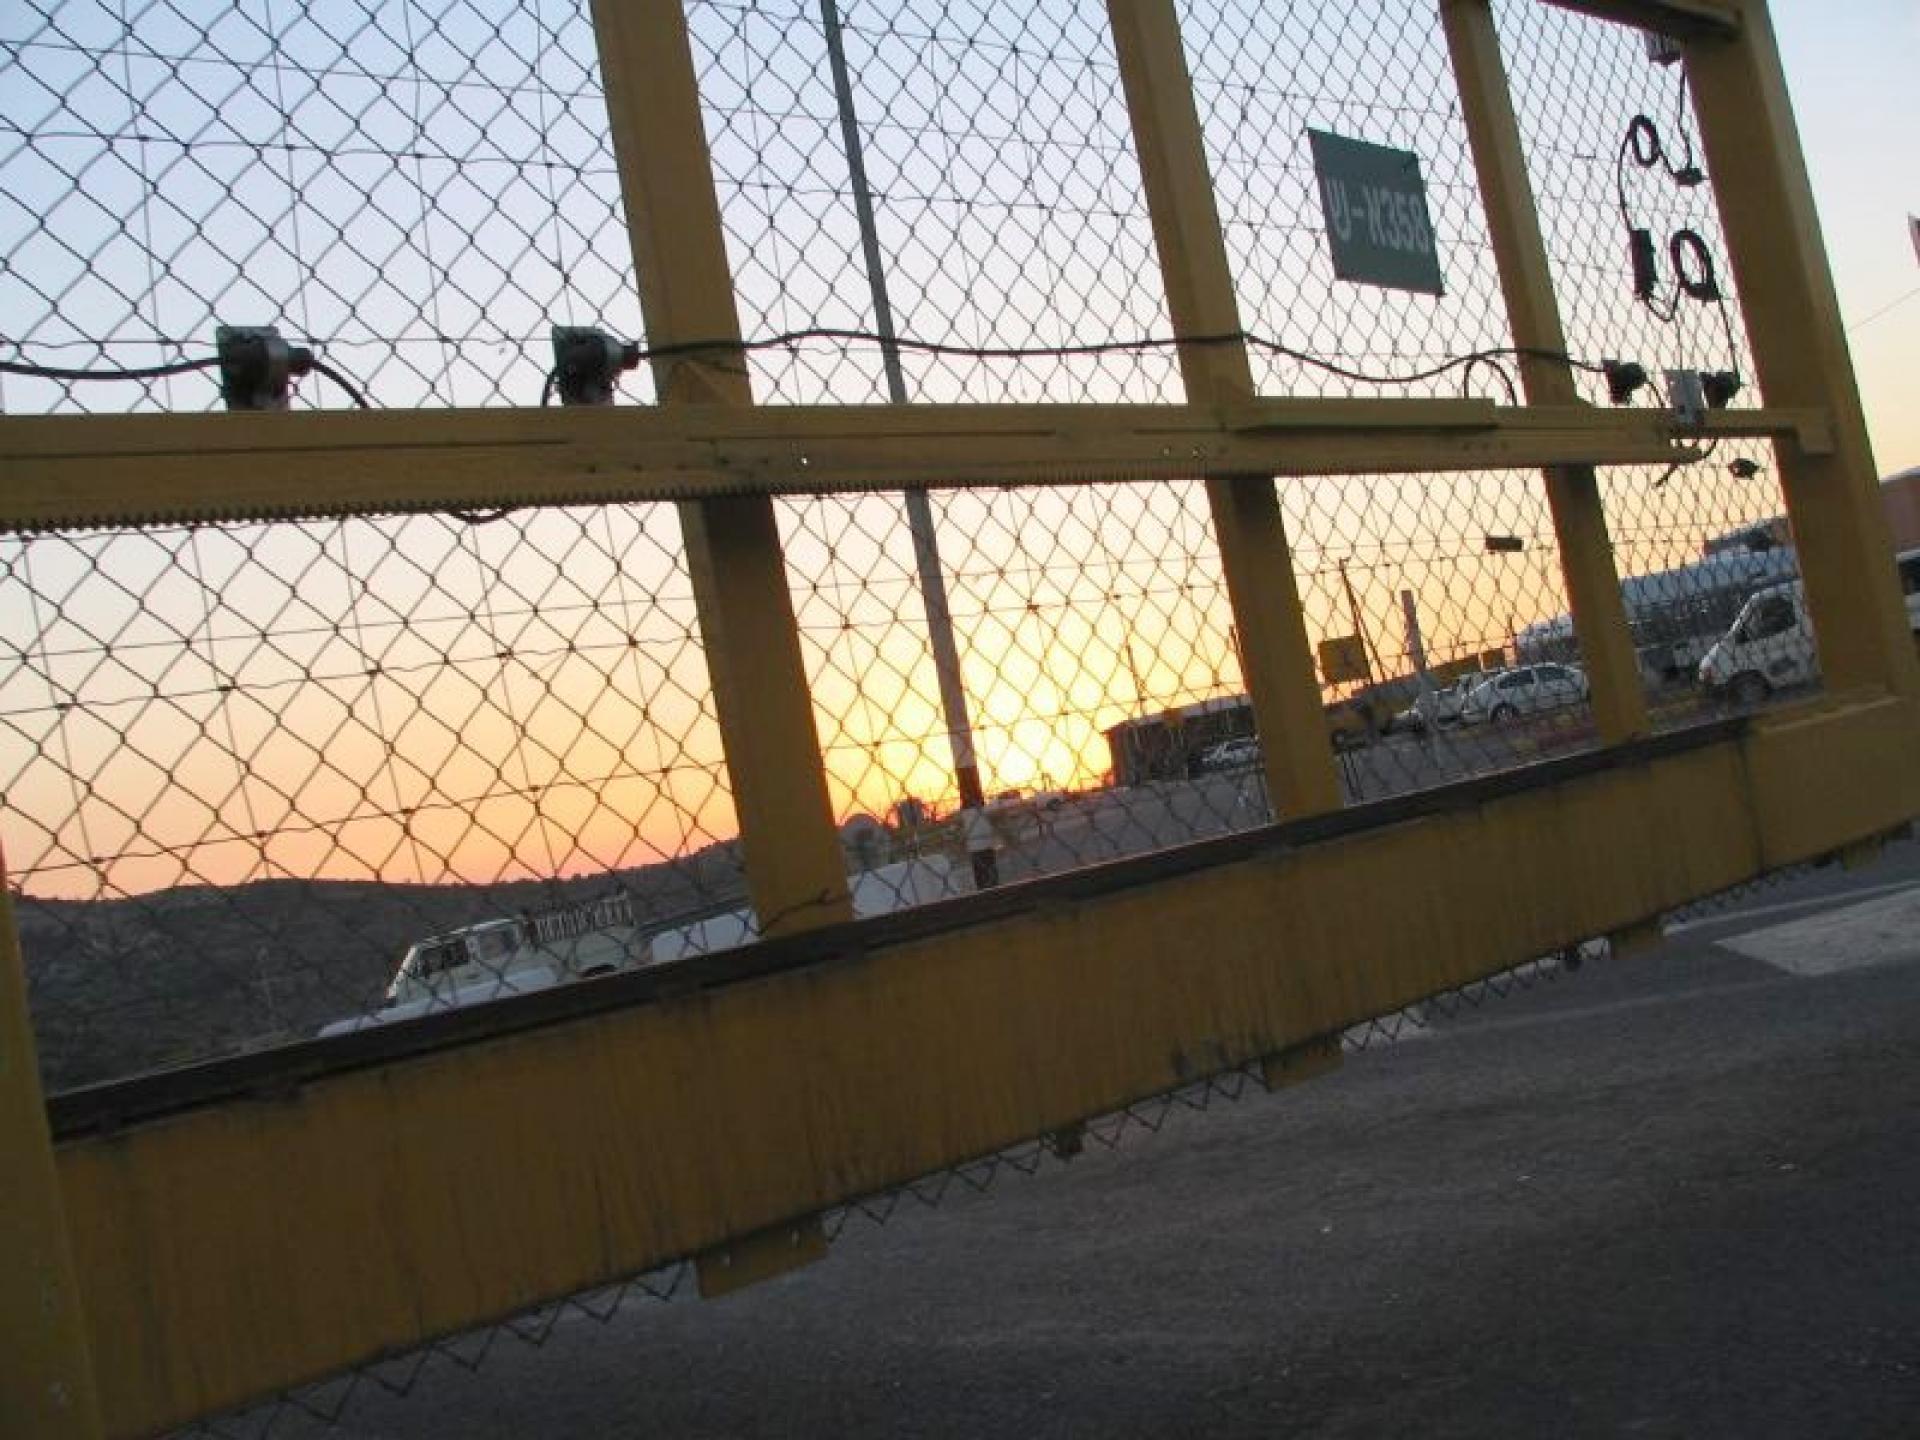 Barta'a/Reikhan checkpoint 12.11.05